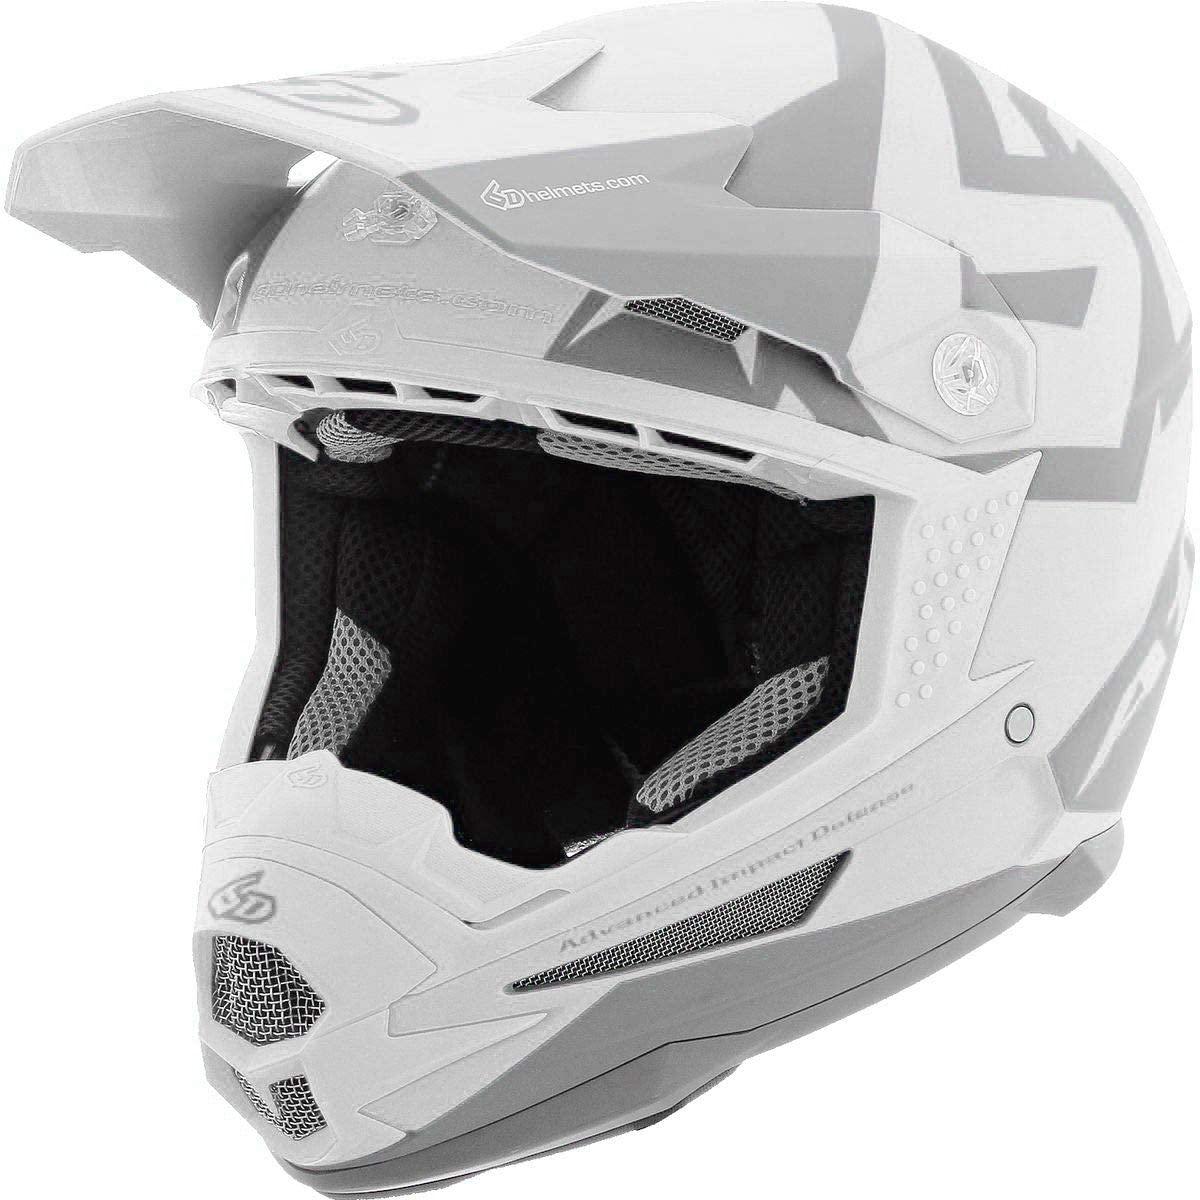 6D ATR-1 Switch Matte Offroad Helmet - White/Black - Large